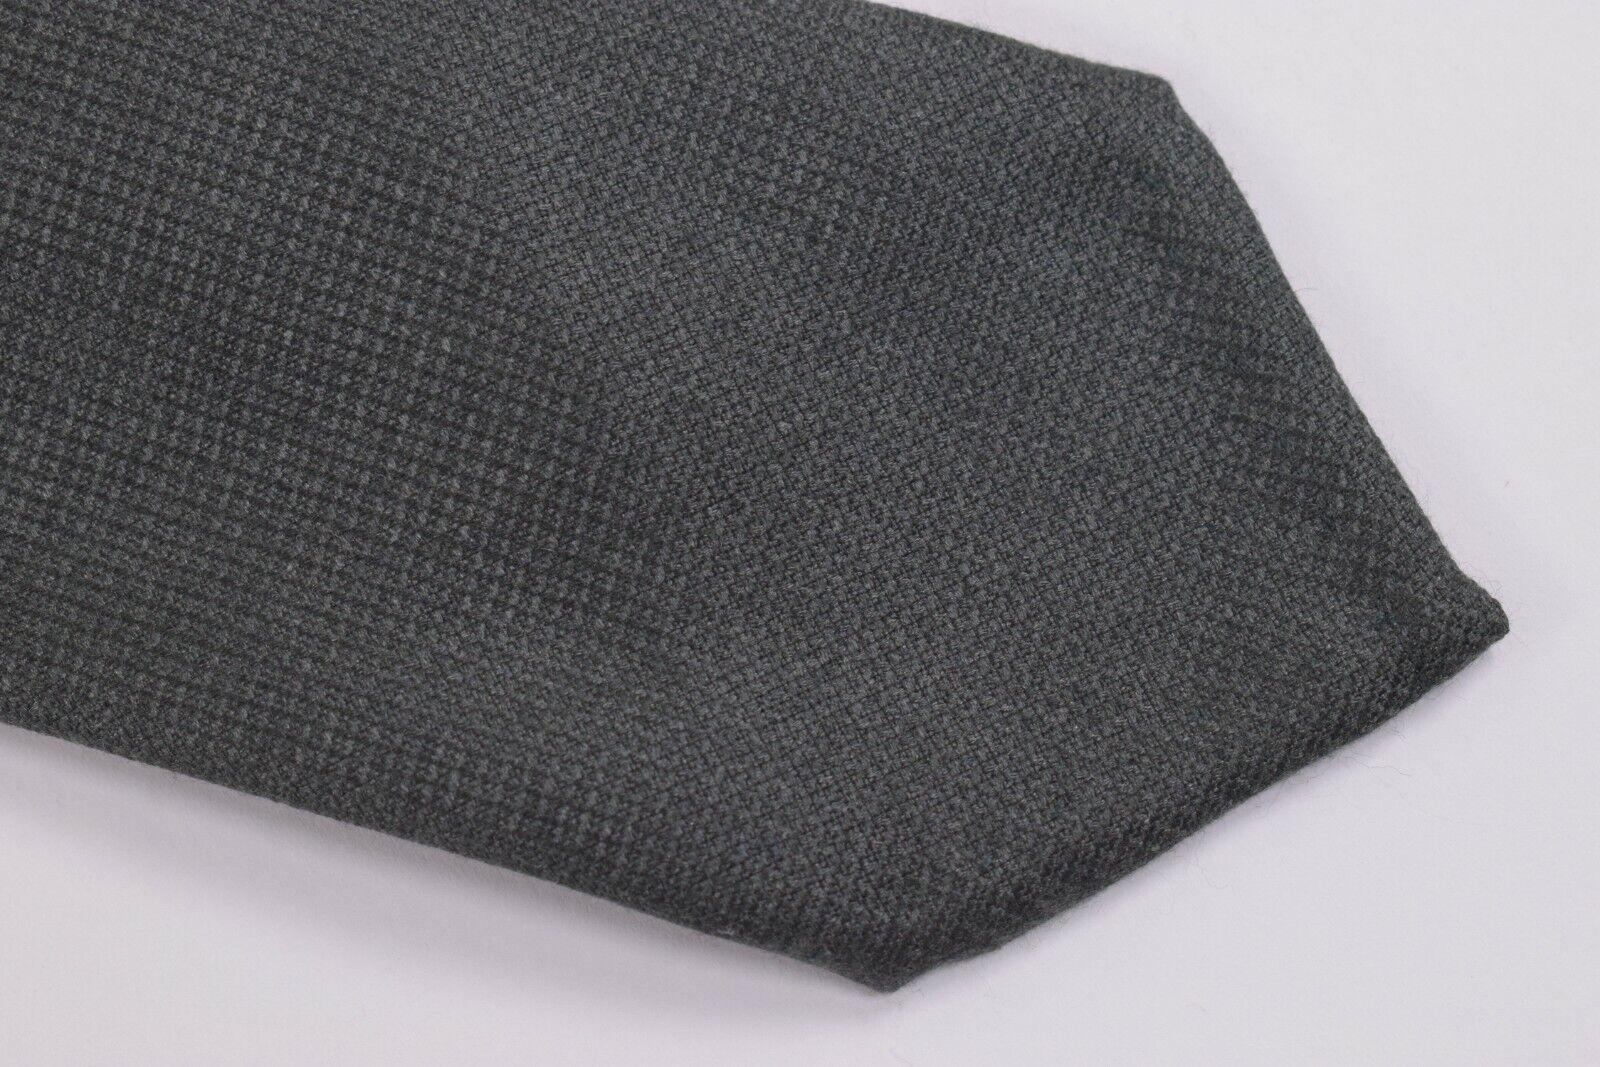 Belvest Neck Tie NWT Charcoal Grey Cashmere Blend